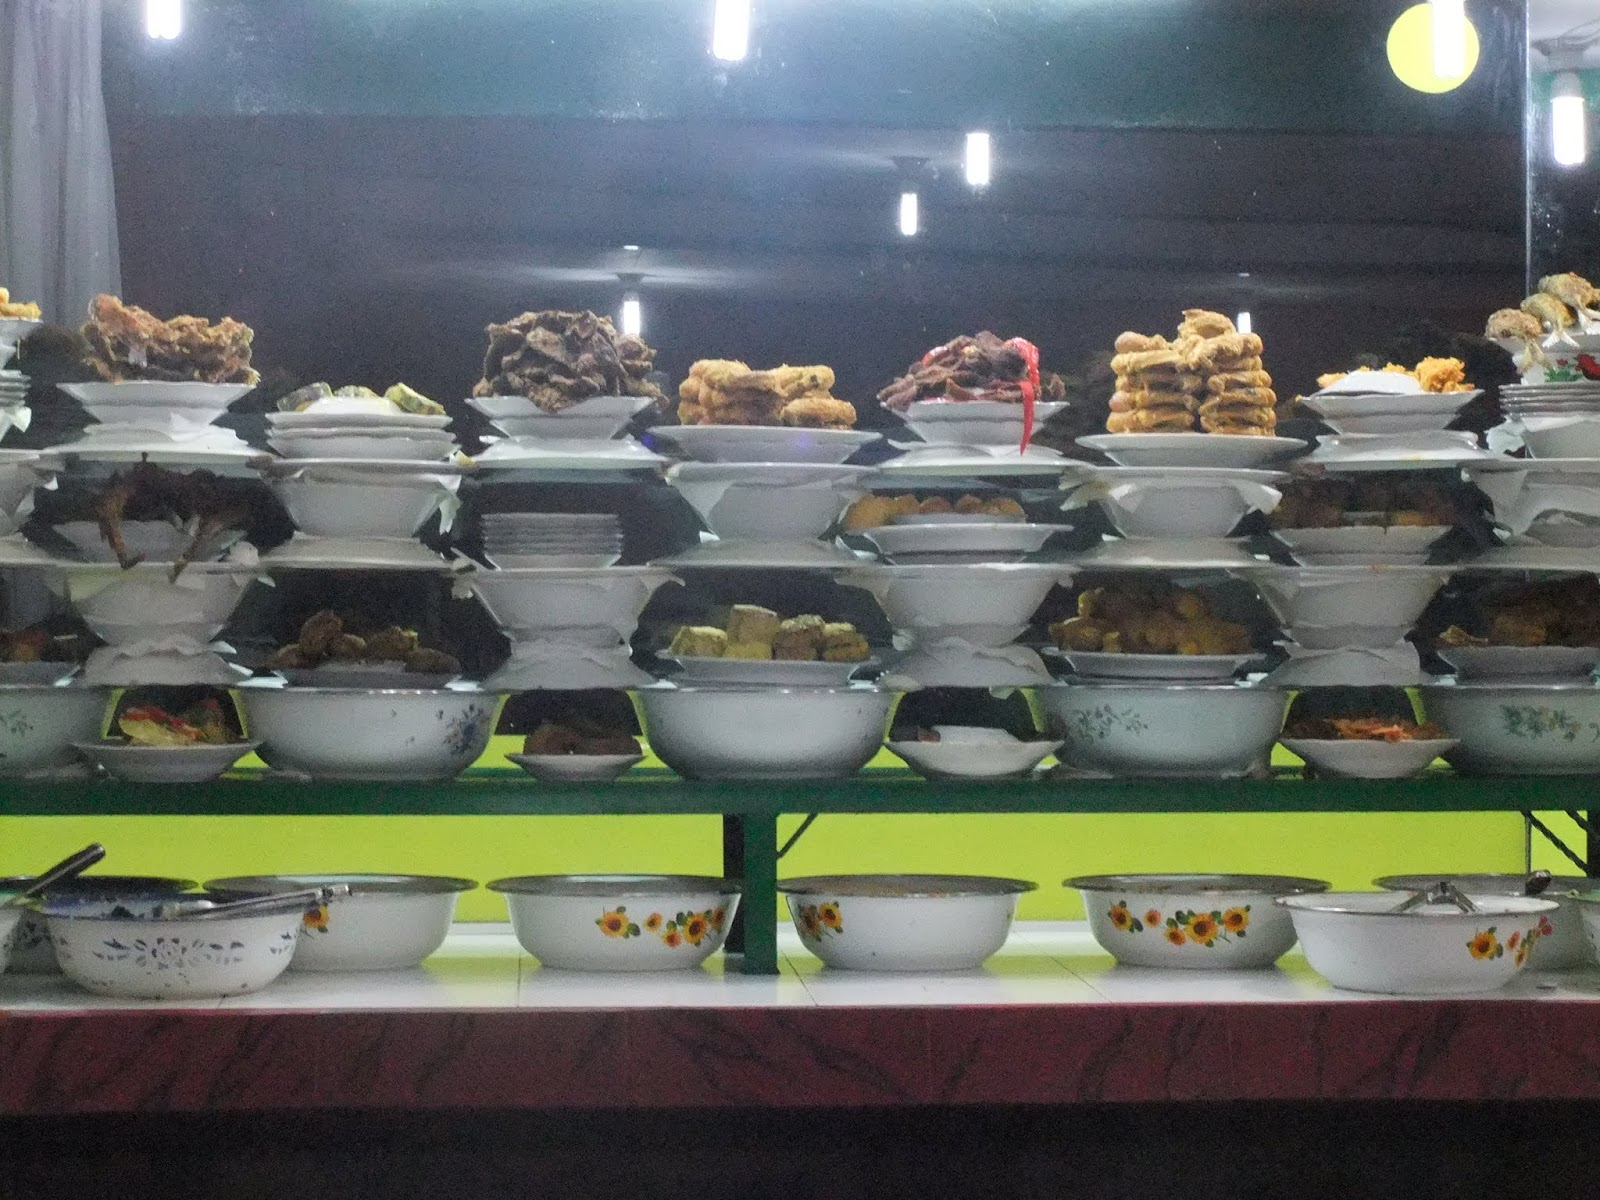 10 Cara Mengetahui Rumah Makan Padang Asli Atau Tidak